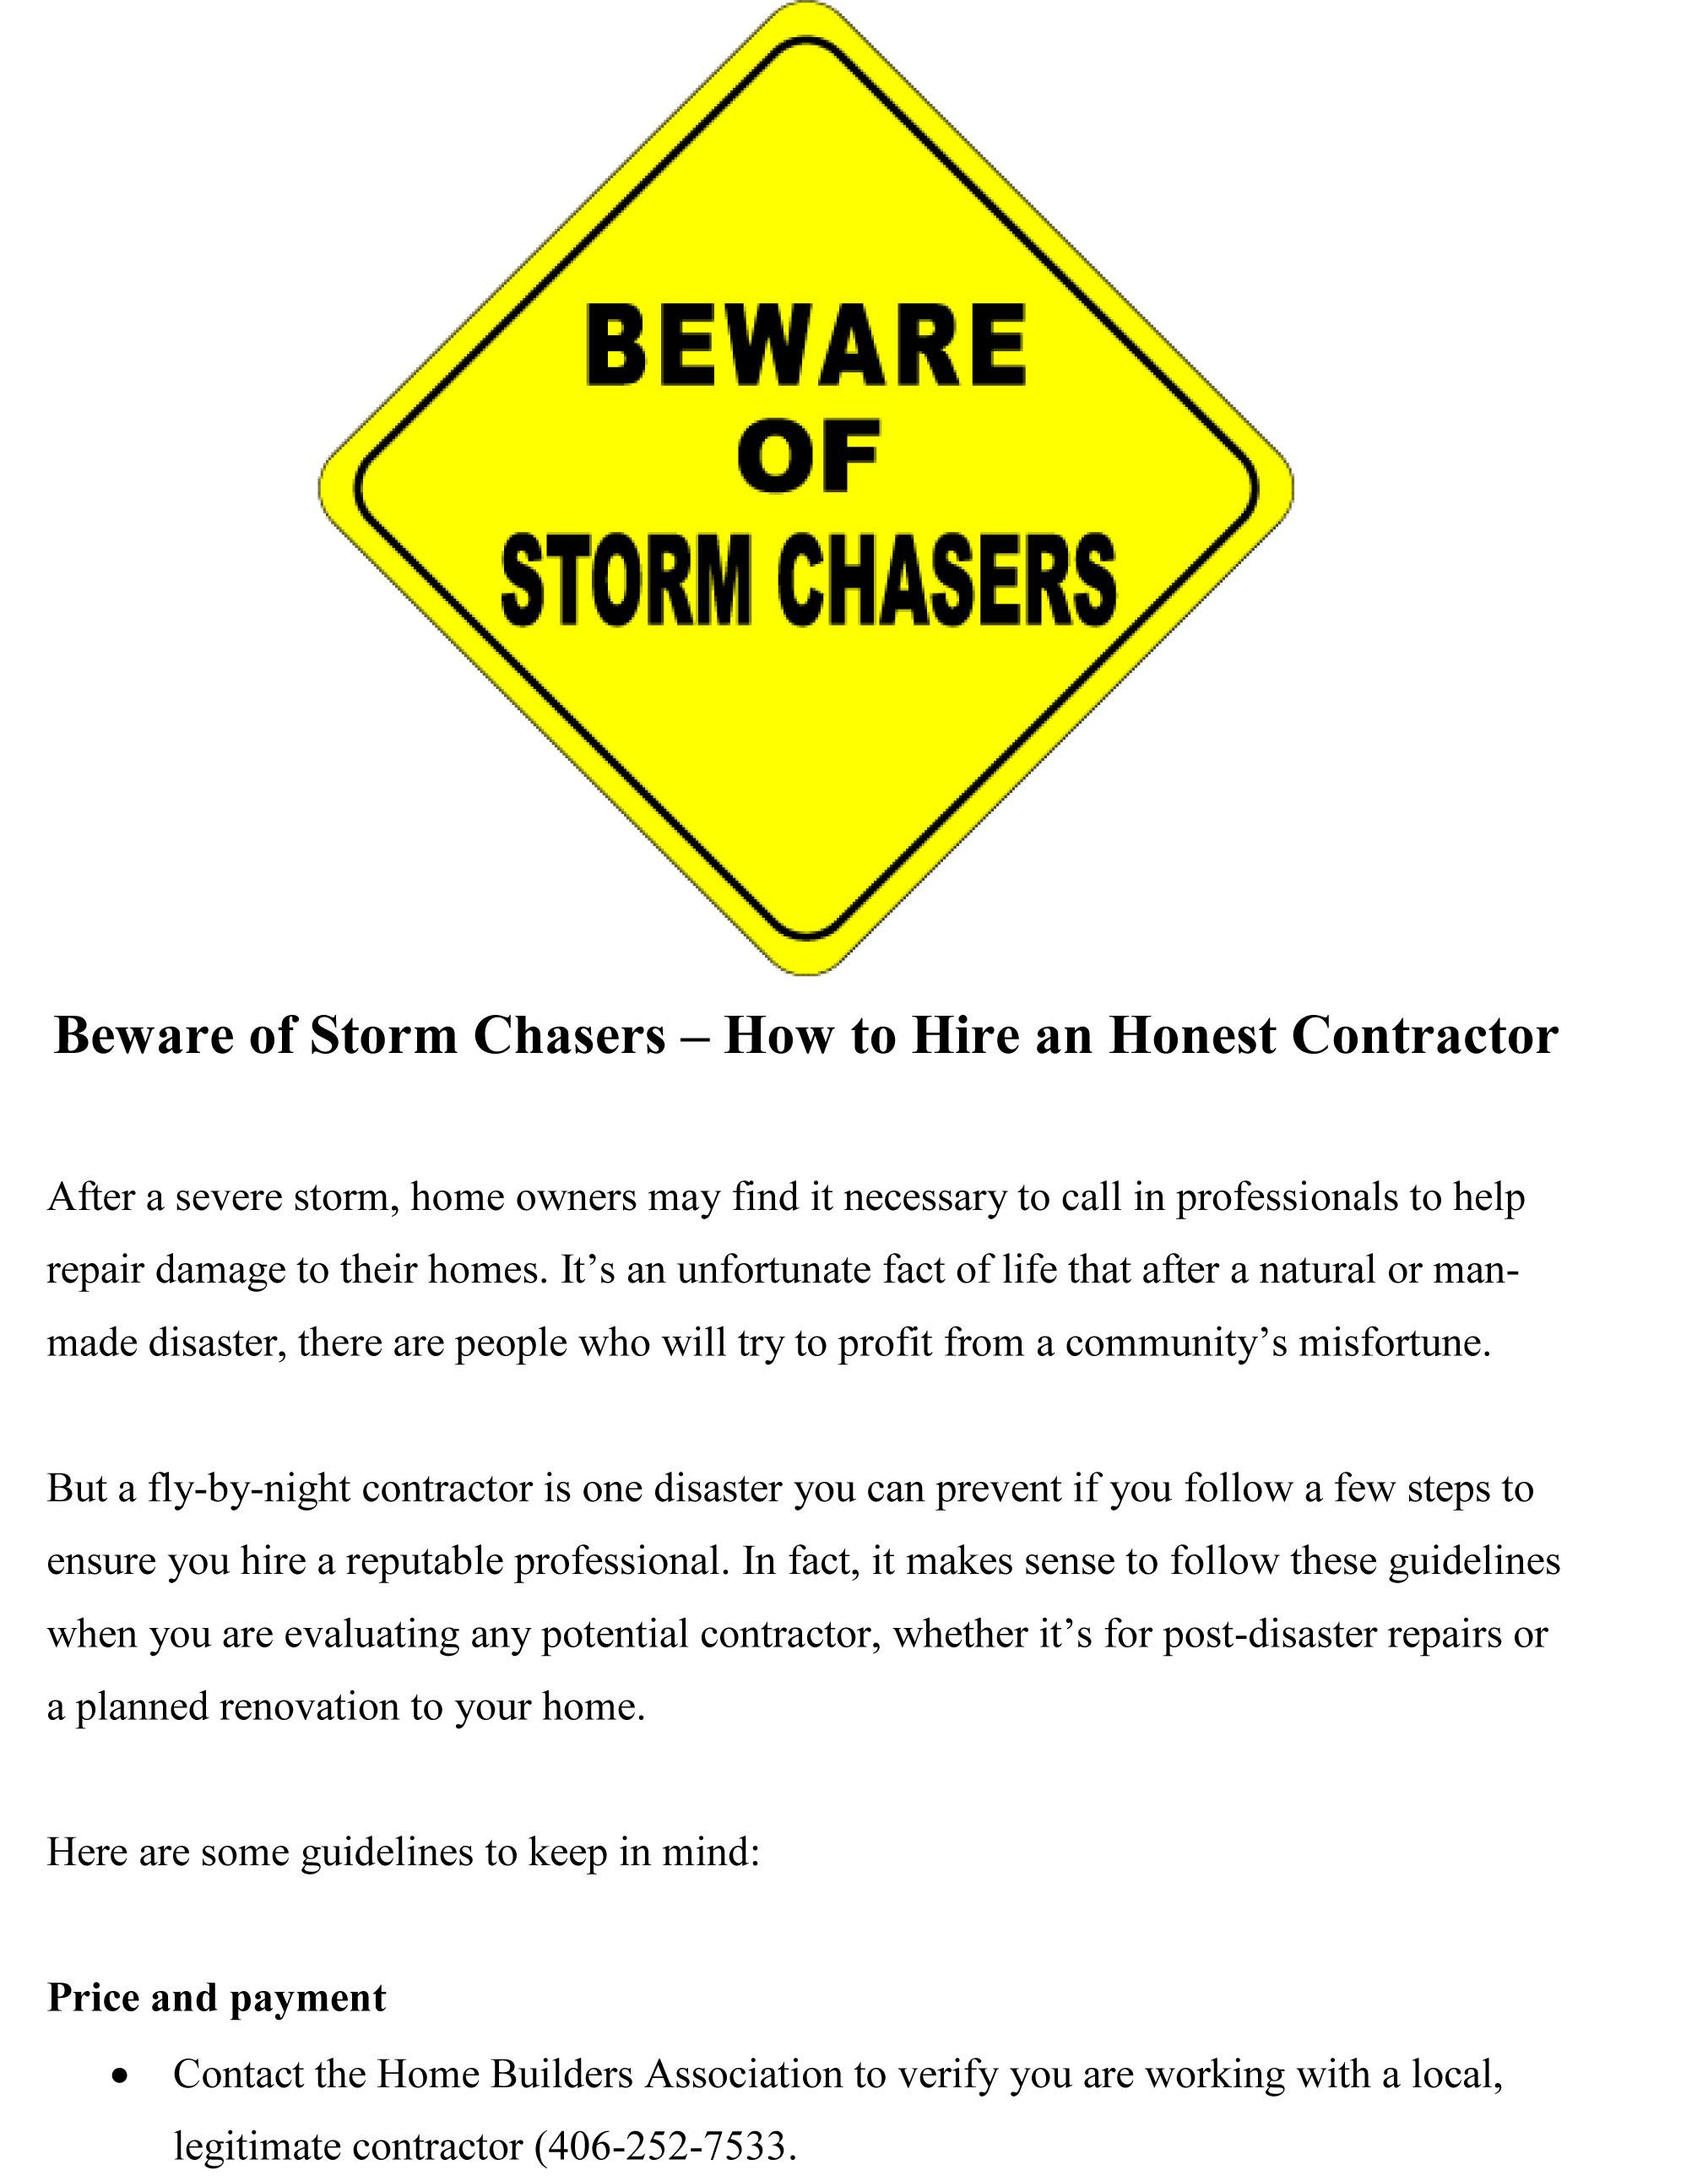 Home Builders Association of Billings, Inc